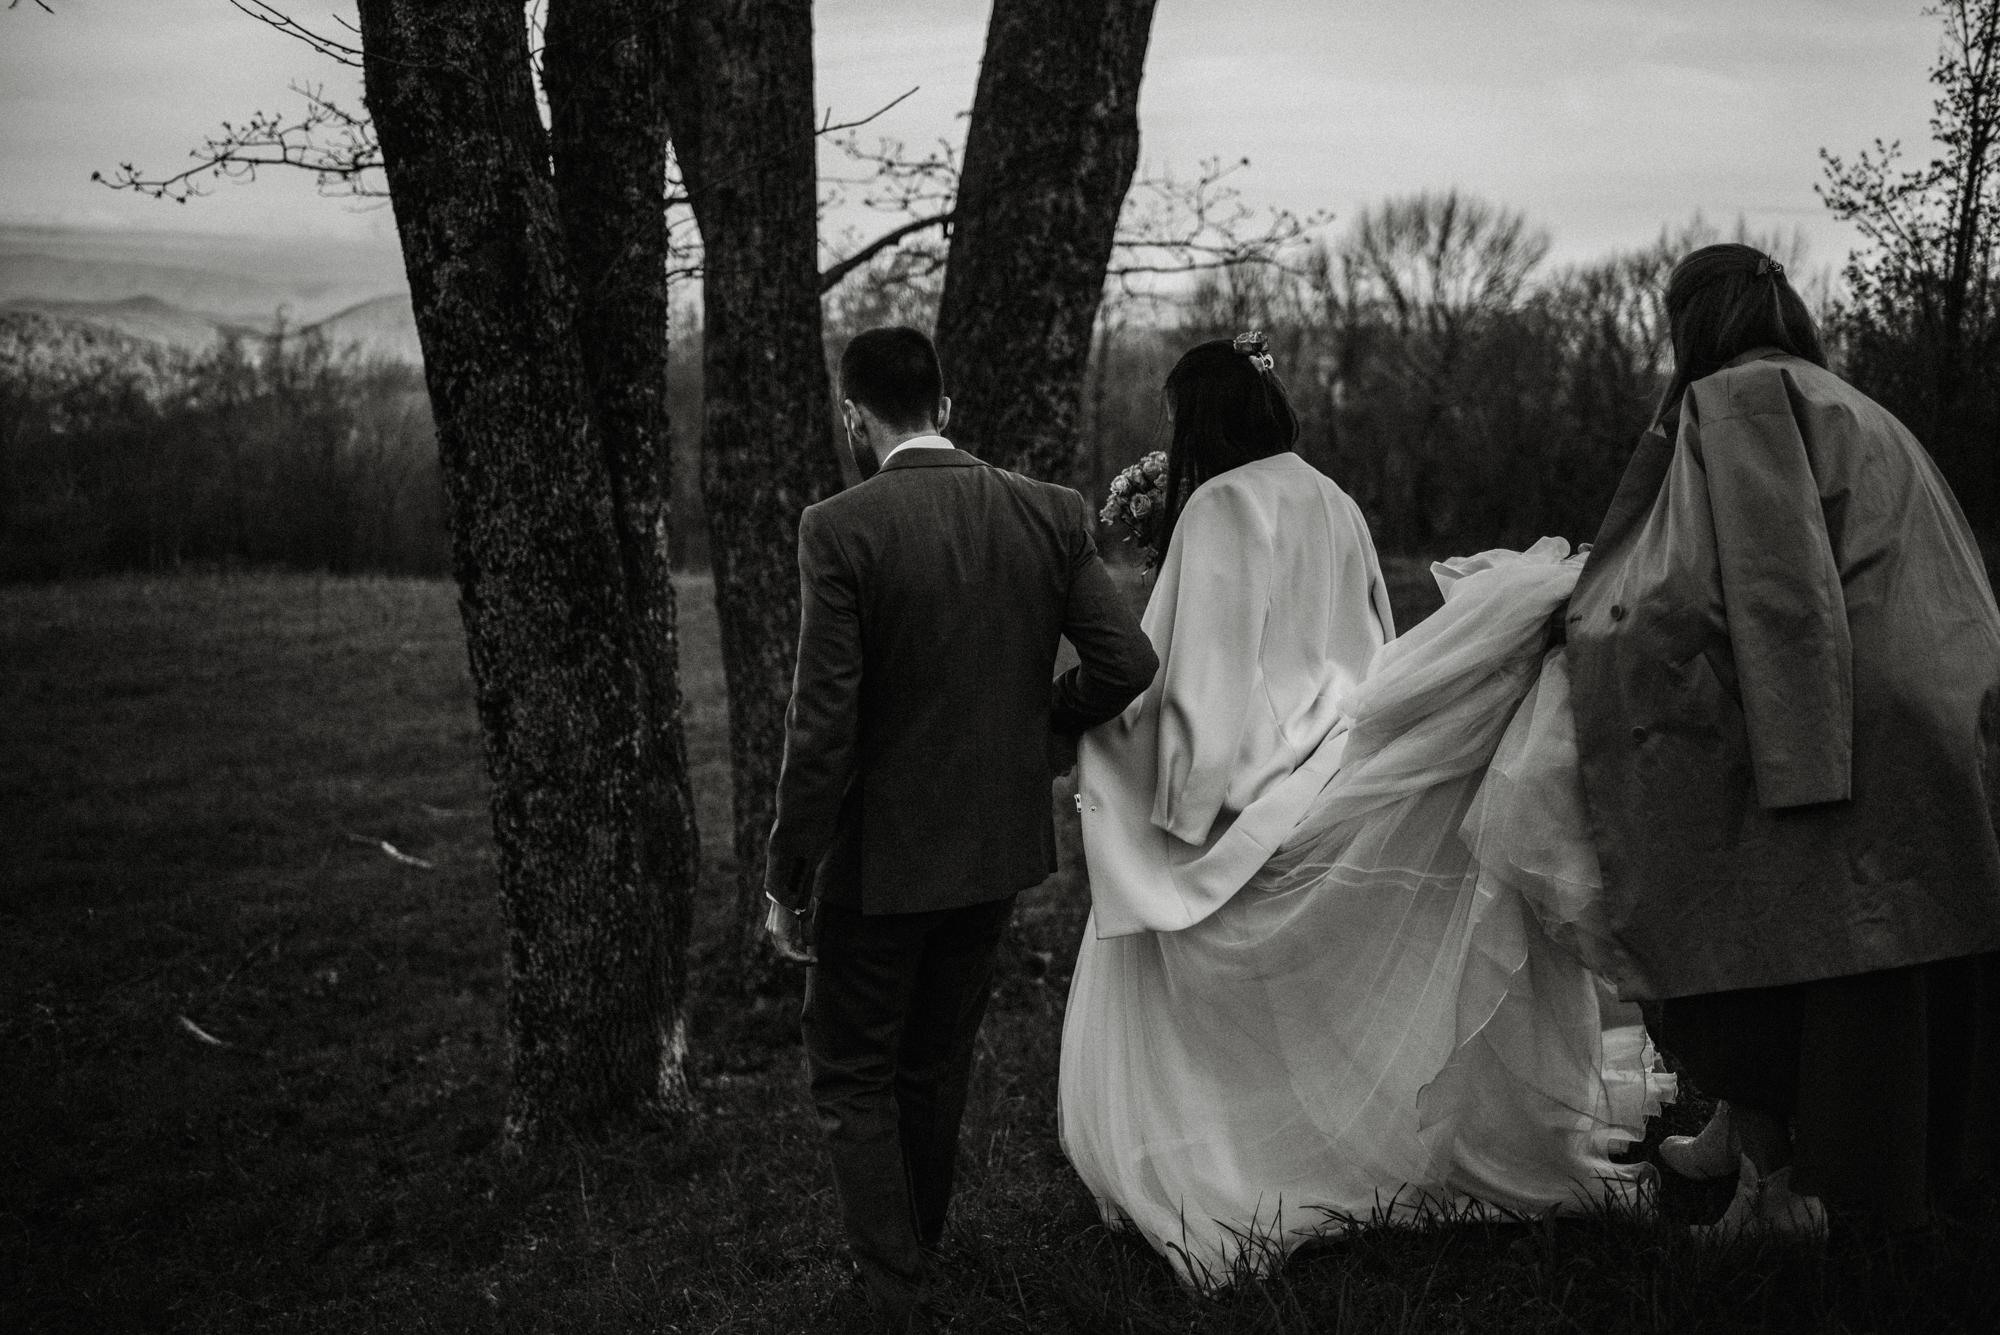 Paula and Andrew - Small Adventurous Wedding in Shenandoah National Park - Blue Ridge Mountain Wedding - White Sails Creative - Mountain Elopement_2.jpg